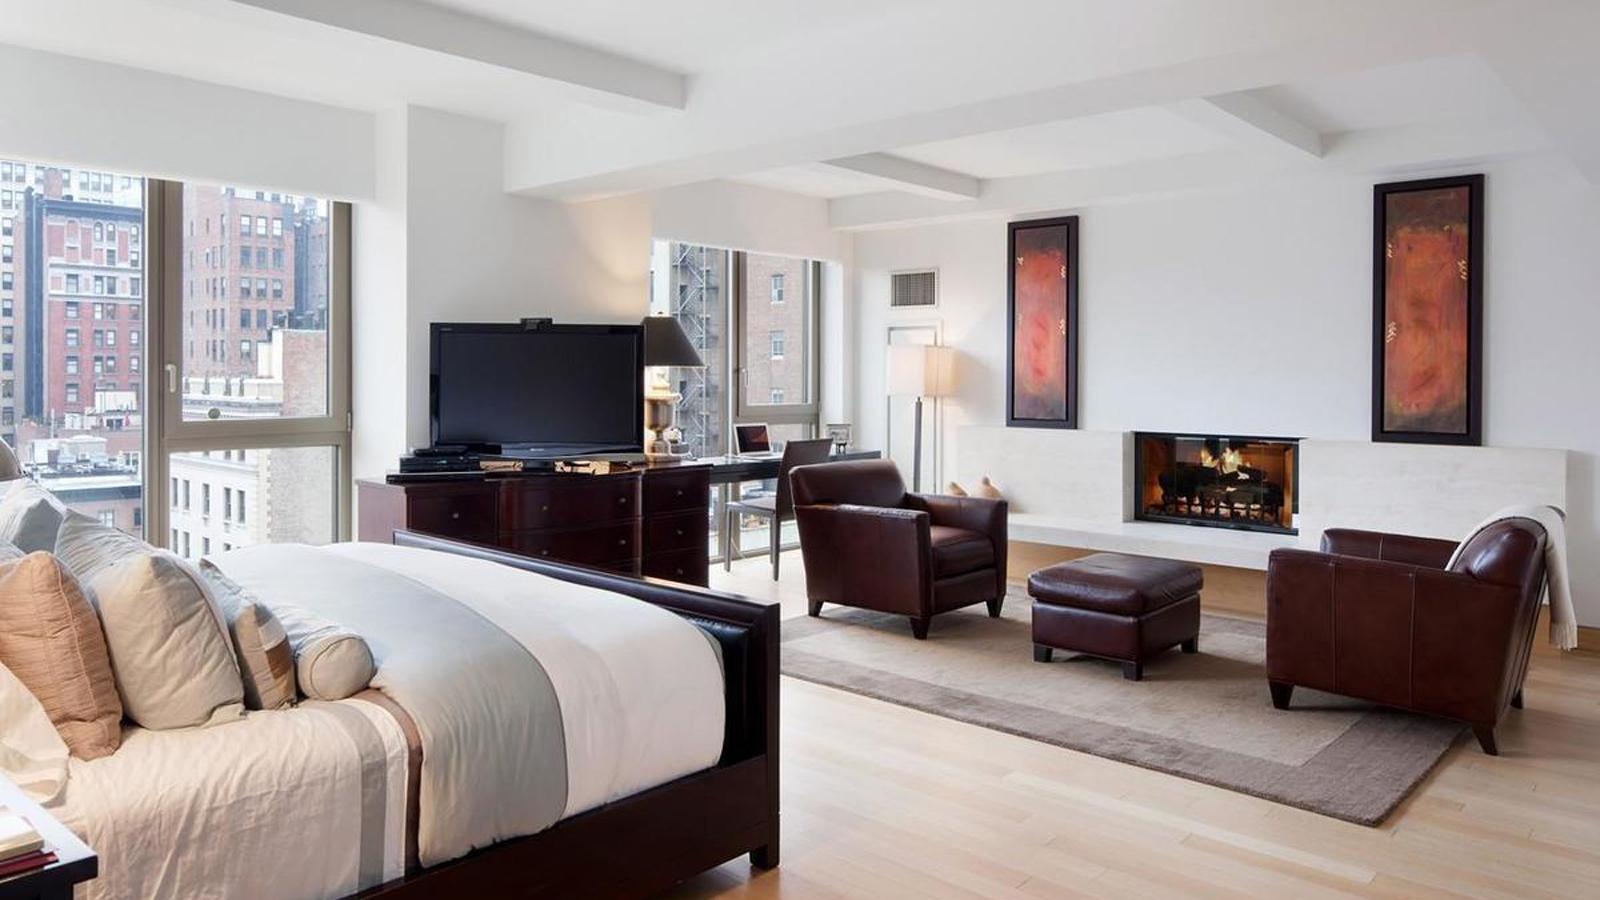 Gramercy Park Hotel, 50 Gramercy Park North